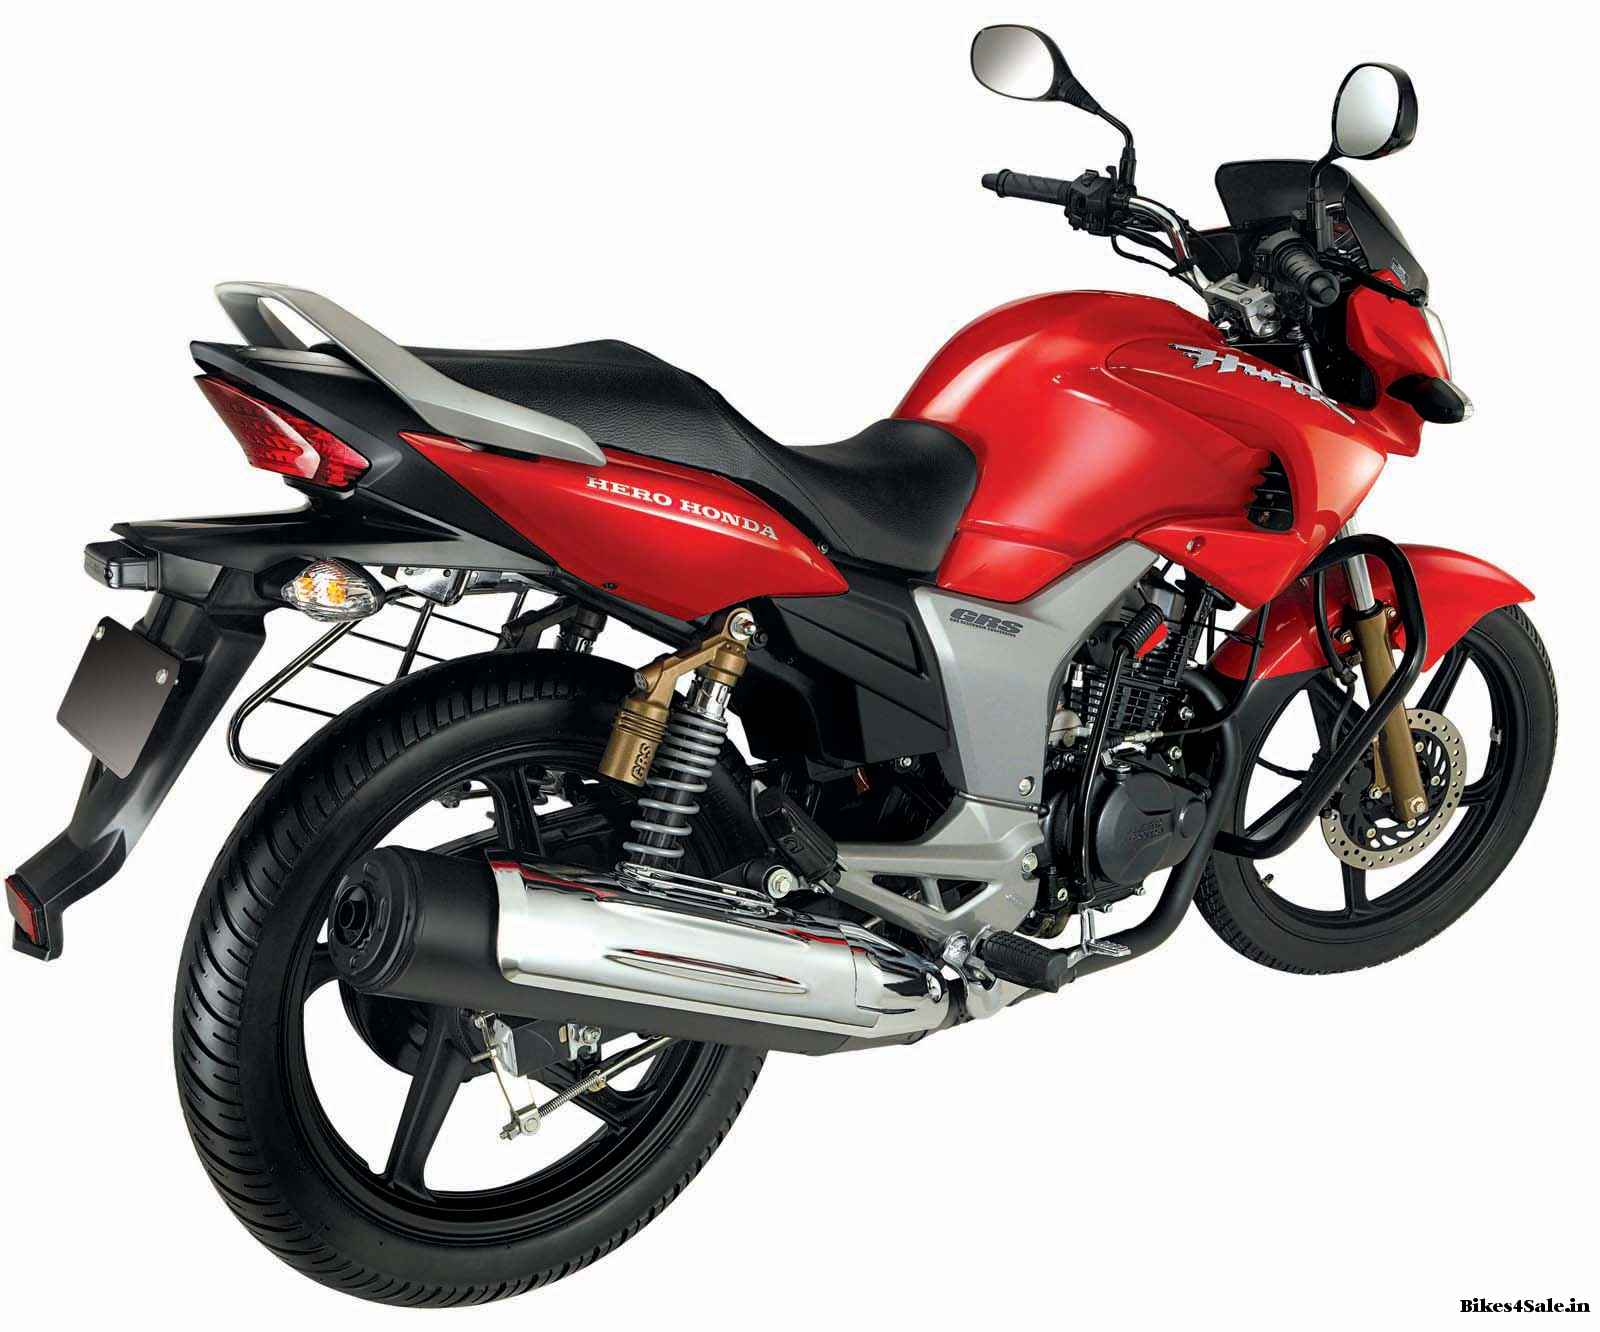 Hero Honda Hunk Bikes4sale